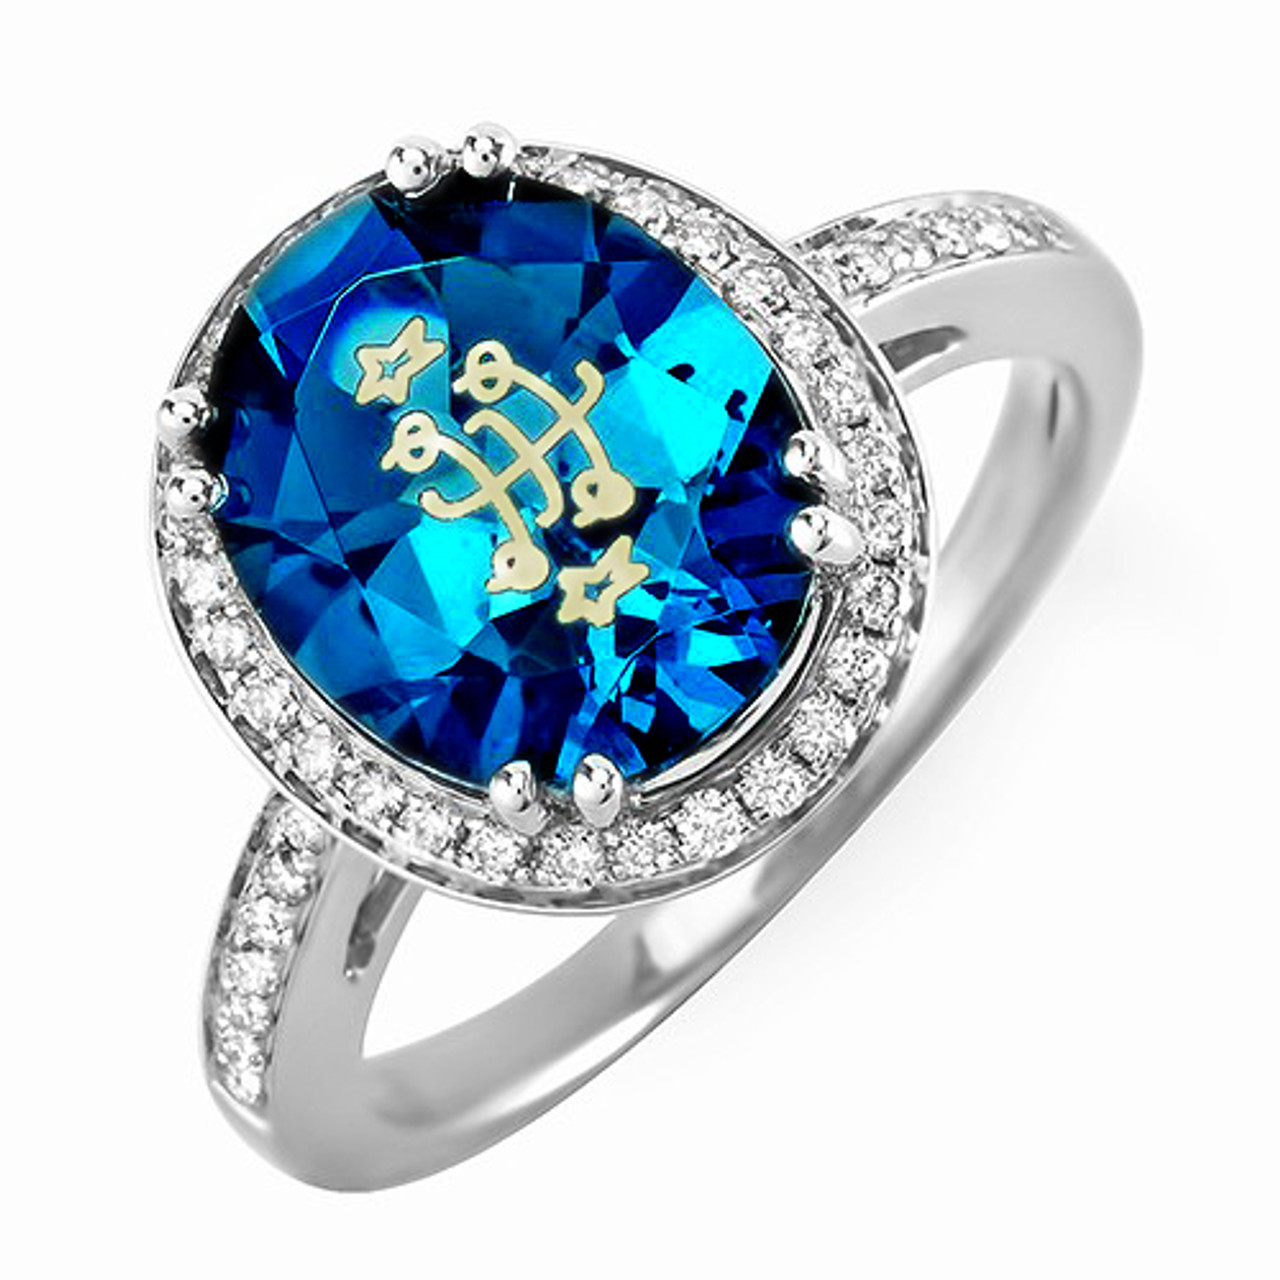 ee8125506222b 14K White Gold Oval Halo London Blue Baha'i Ringstone